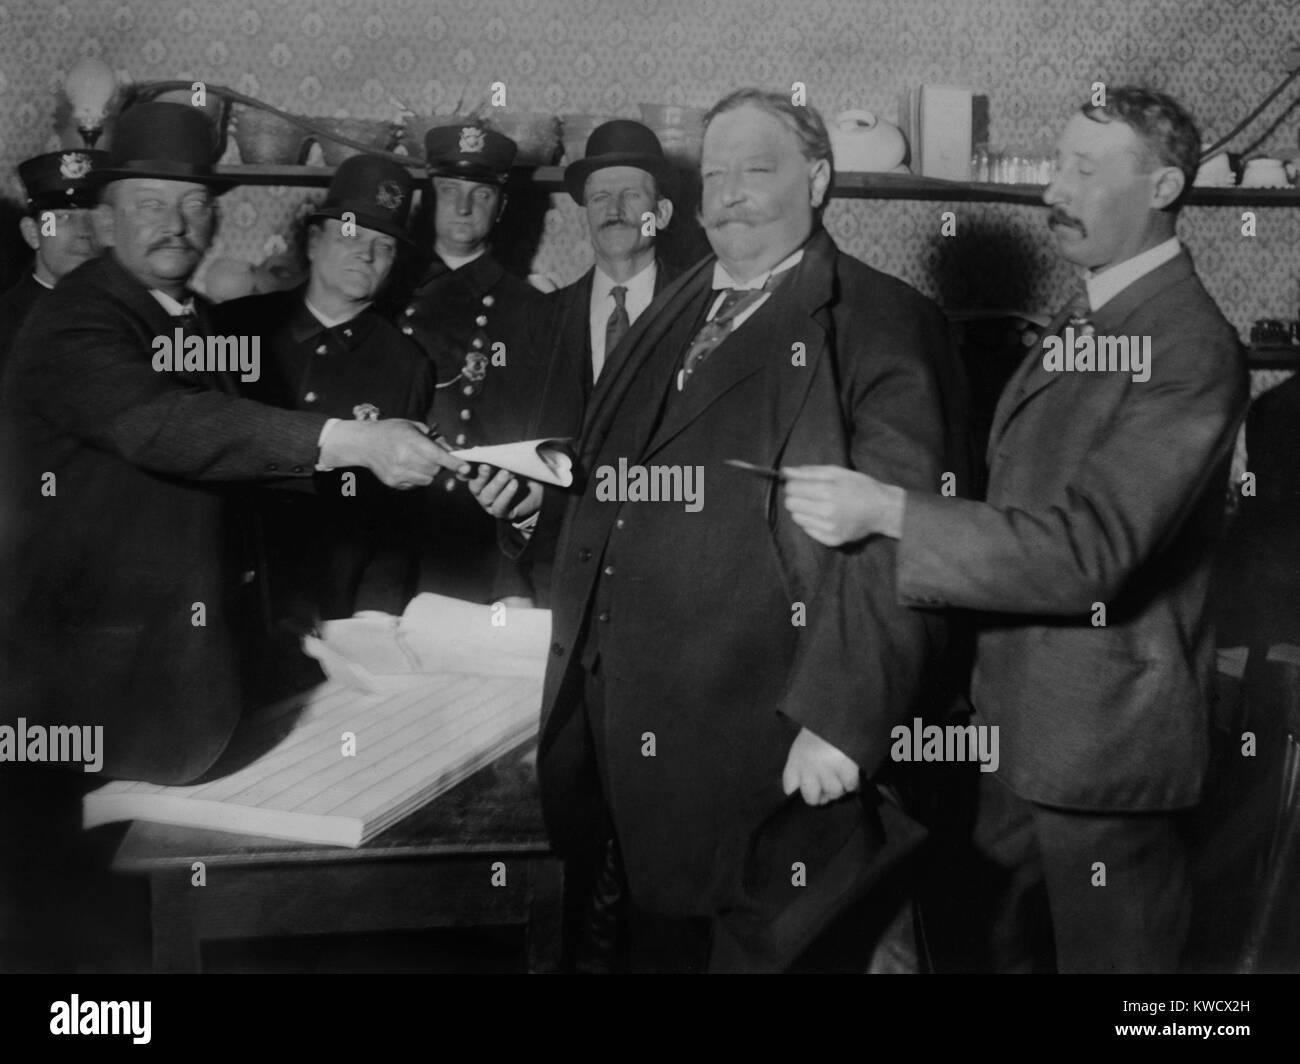 Republican Presidential Candidate William Howard Taft voting in Cincinnati, Nov. 3, 1908 (BSLOC_2017_2_110) - Stock Image